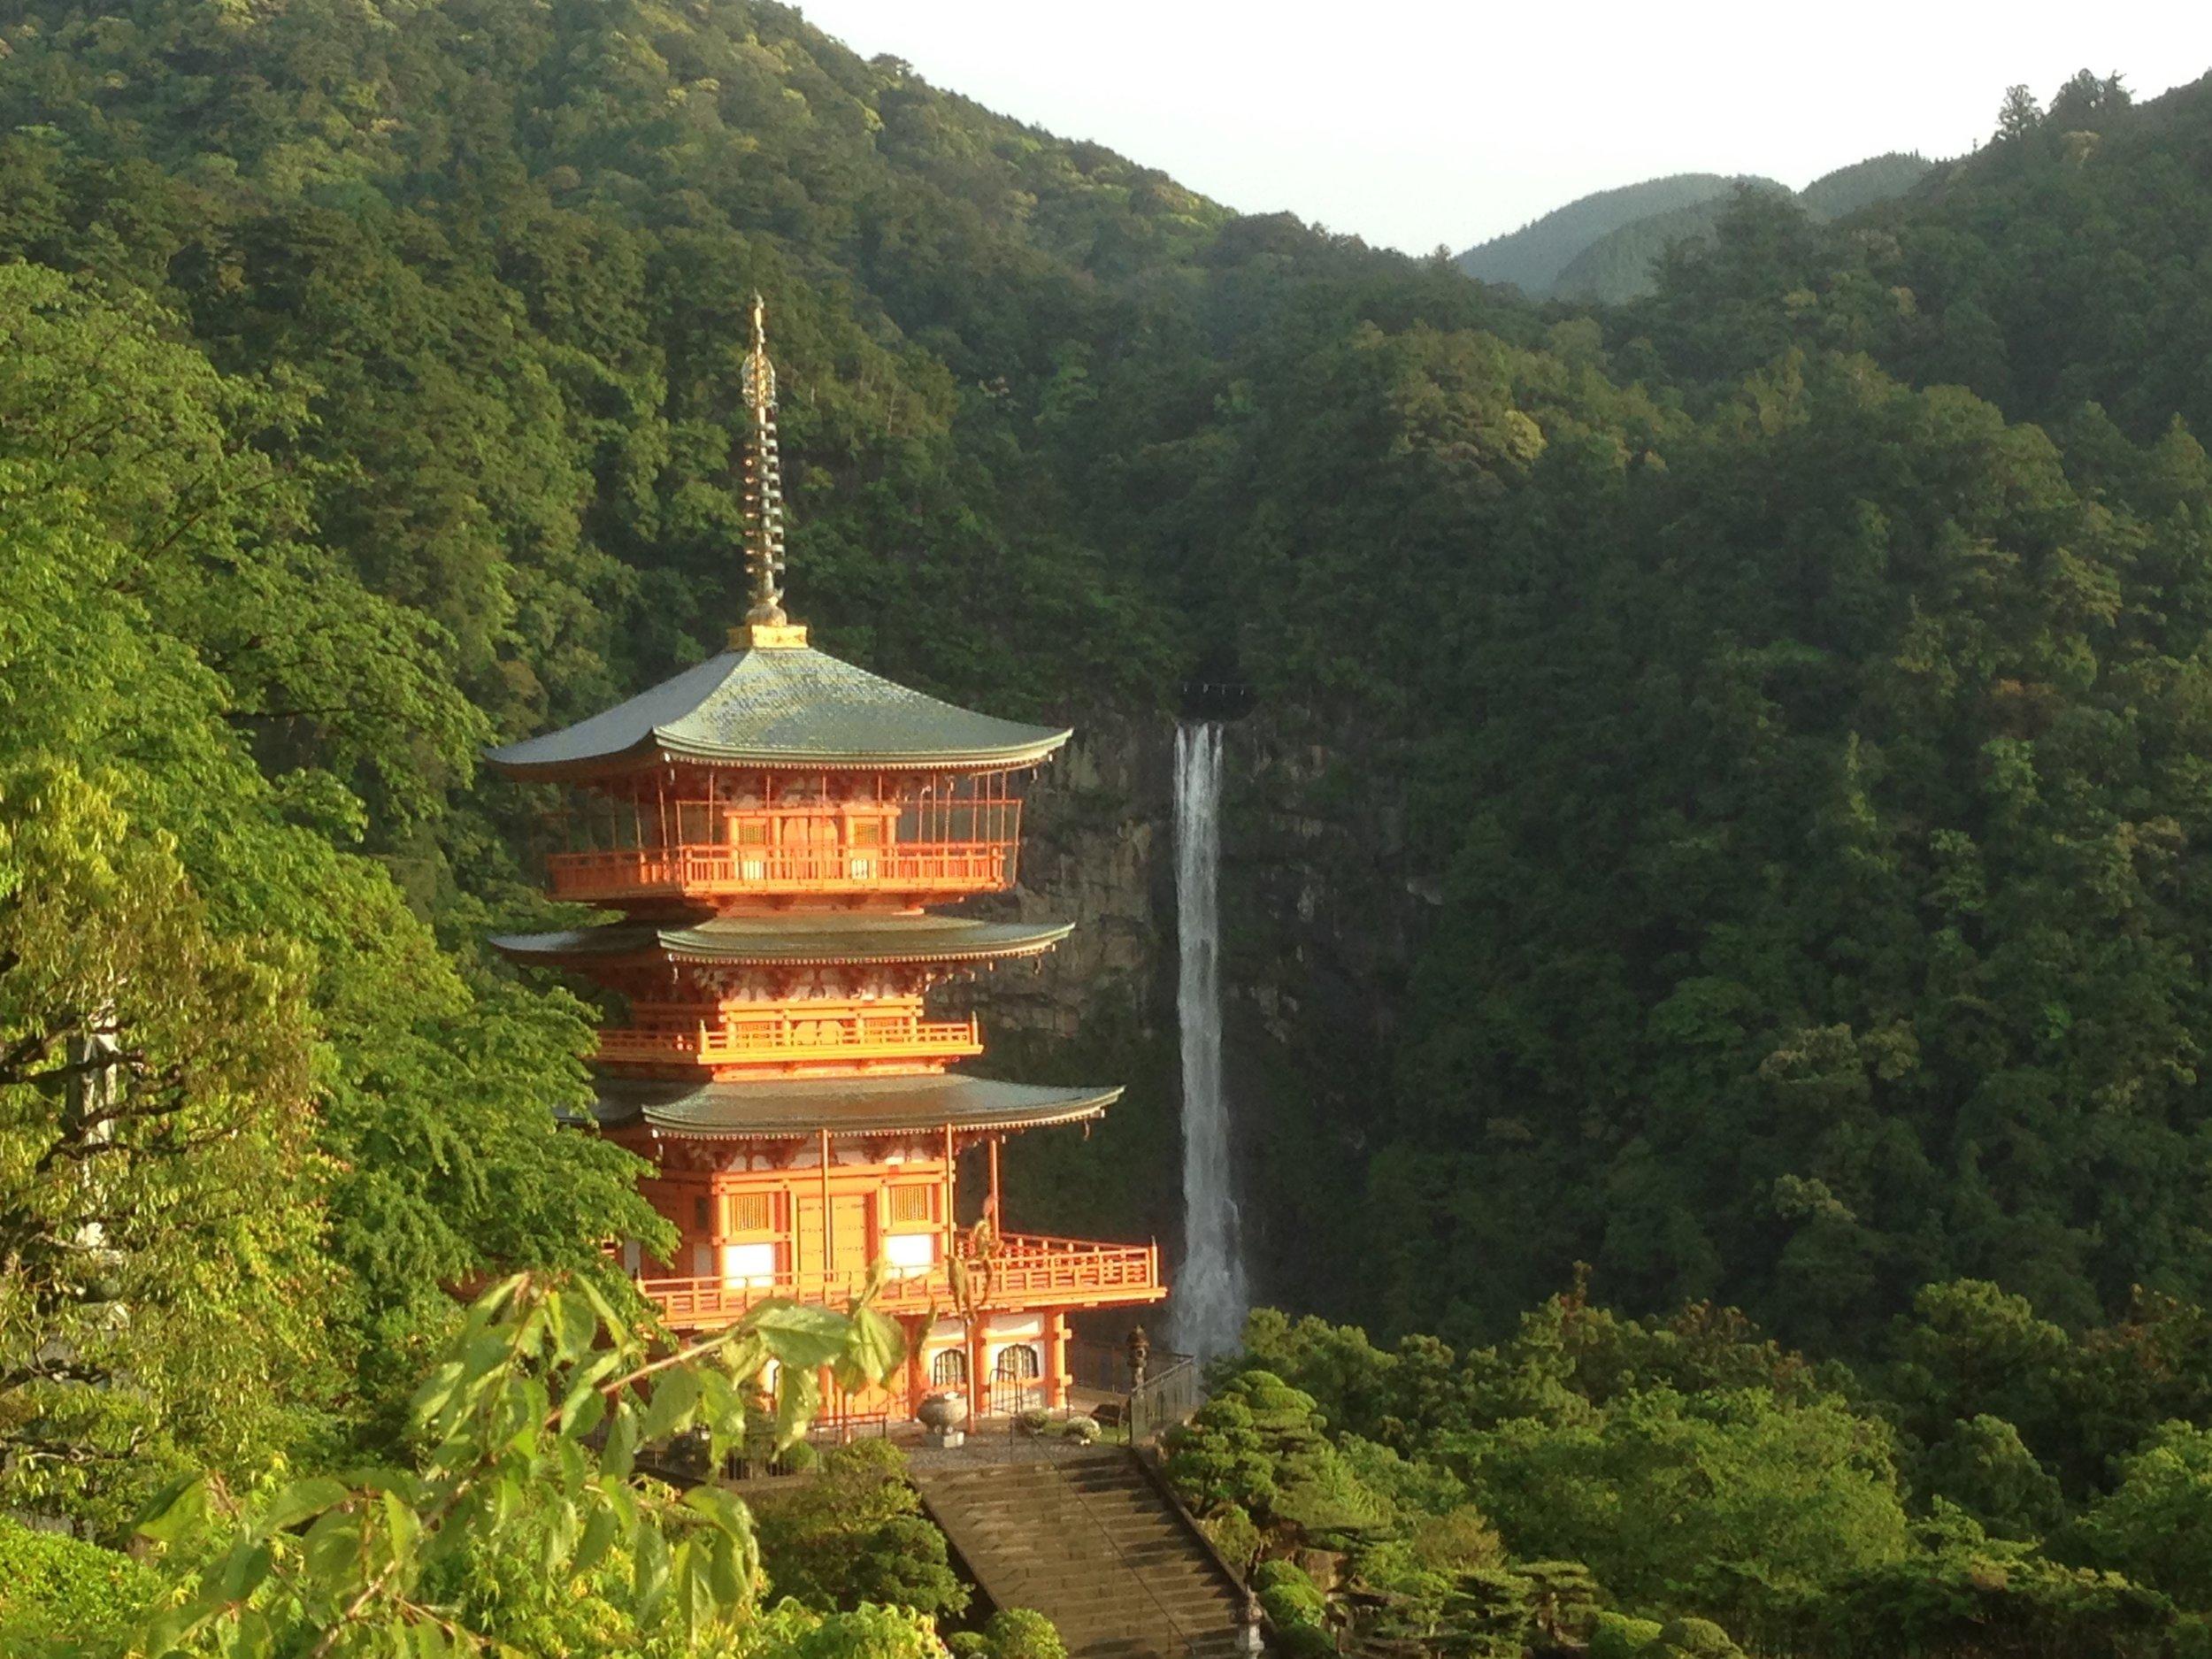 Pagoda with Nachi-no-Otaki, the tallest waterfall in Japan